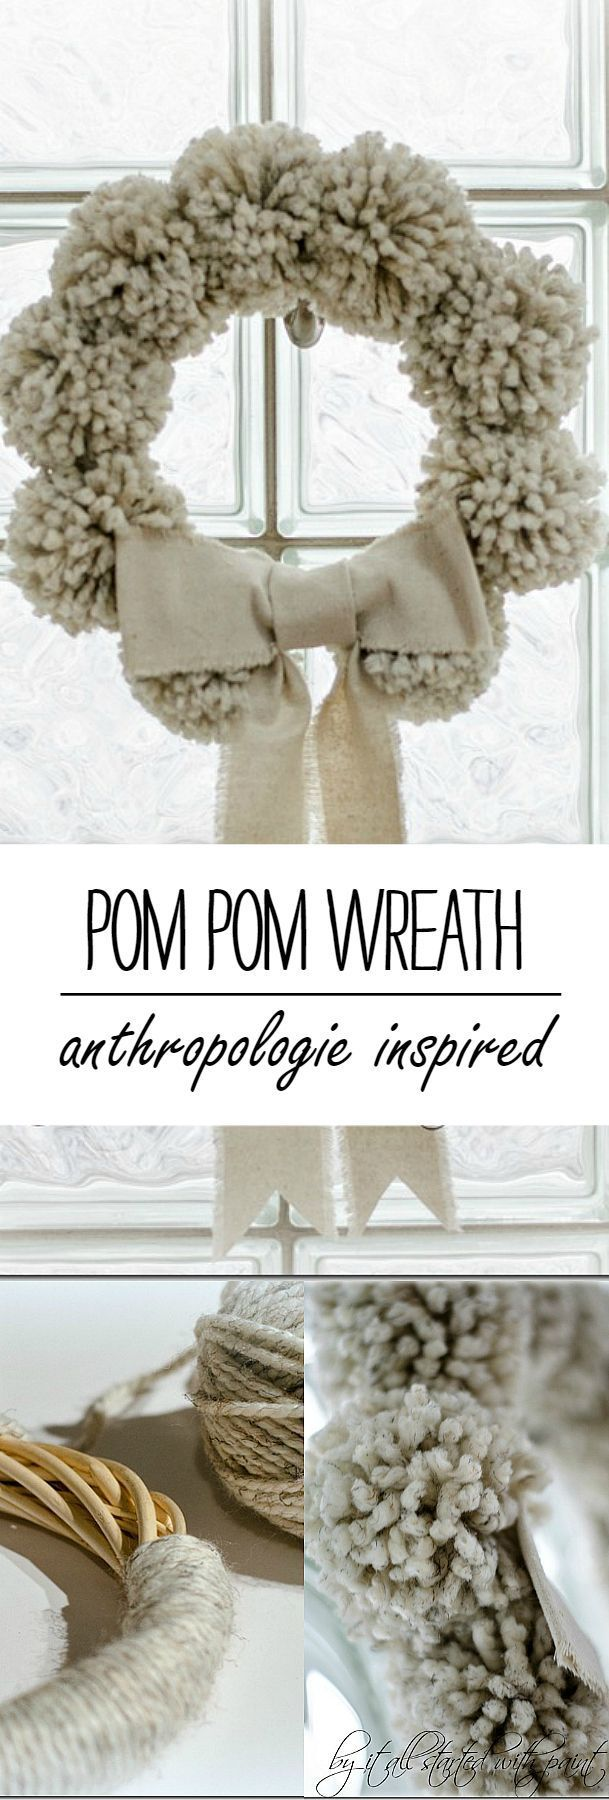 Anthropologie Inspired Pom Pom Wreath